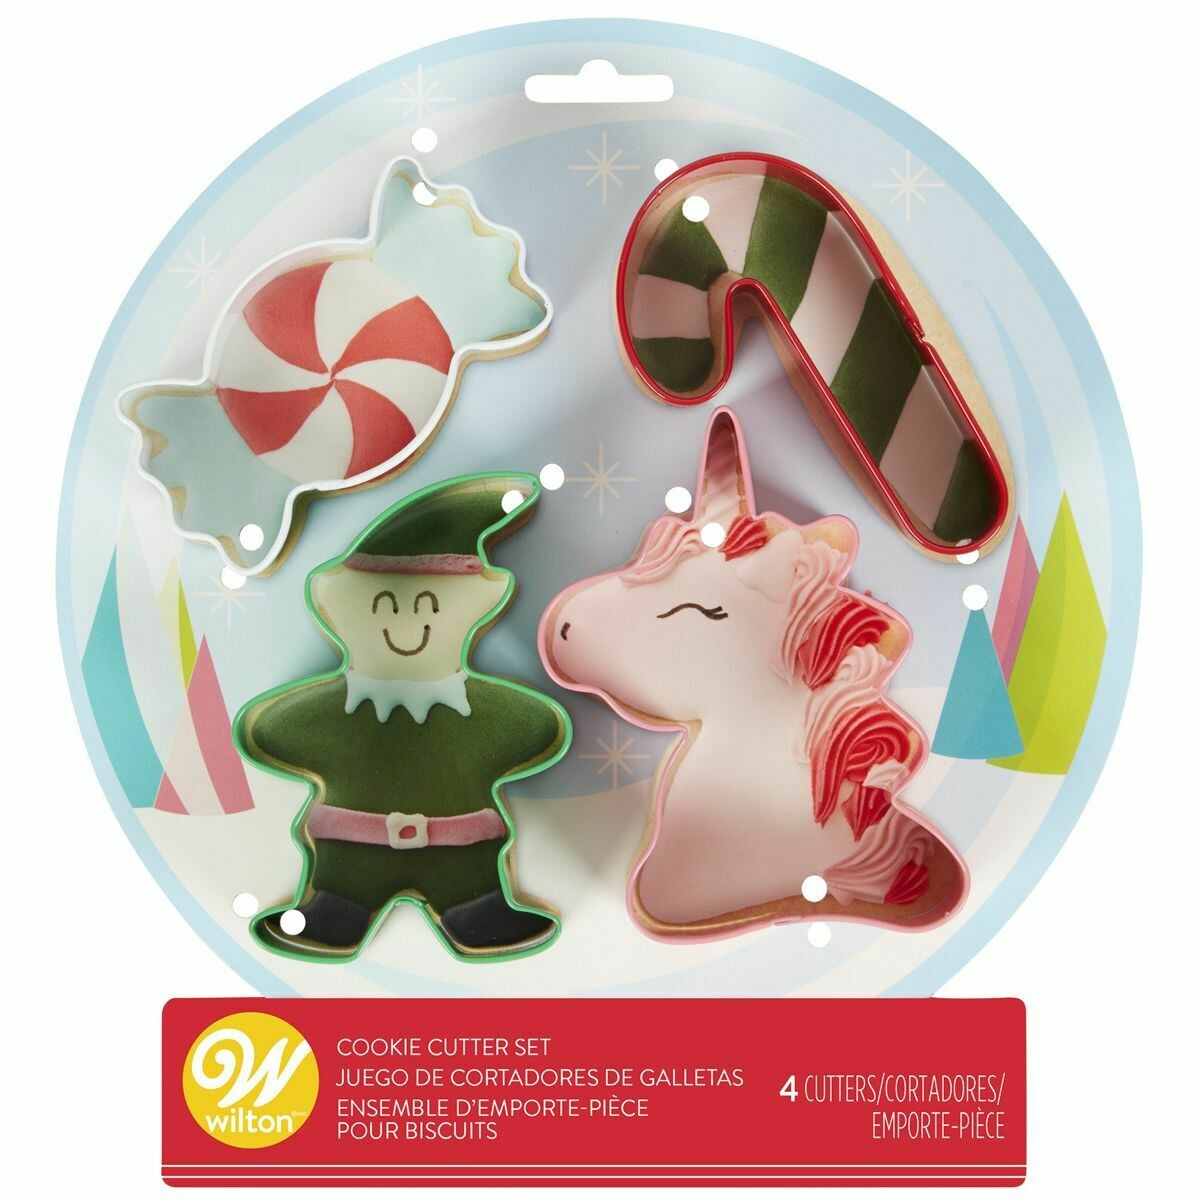 Wilton Christmas Cookie Cutter Set of 4 -SNOW SET - ELF, UNICORN, CANDY CANE, CANDY - Σετ 4τεμ Κουπ πατ - ΞΩΤΙΚΟ, ΜΟΝΟΚΕΡΟΣ, ΚΑΡΑΜΕΛΑ, ΓΛΕΙΦΙΤΖΟΥΡΙ